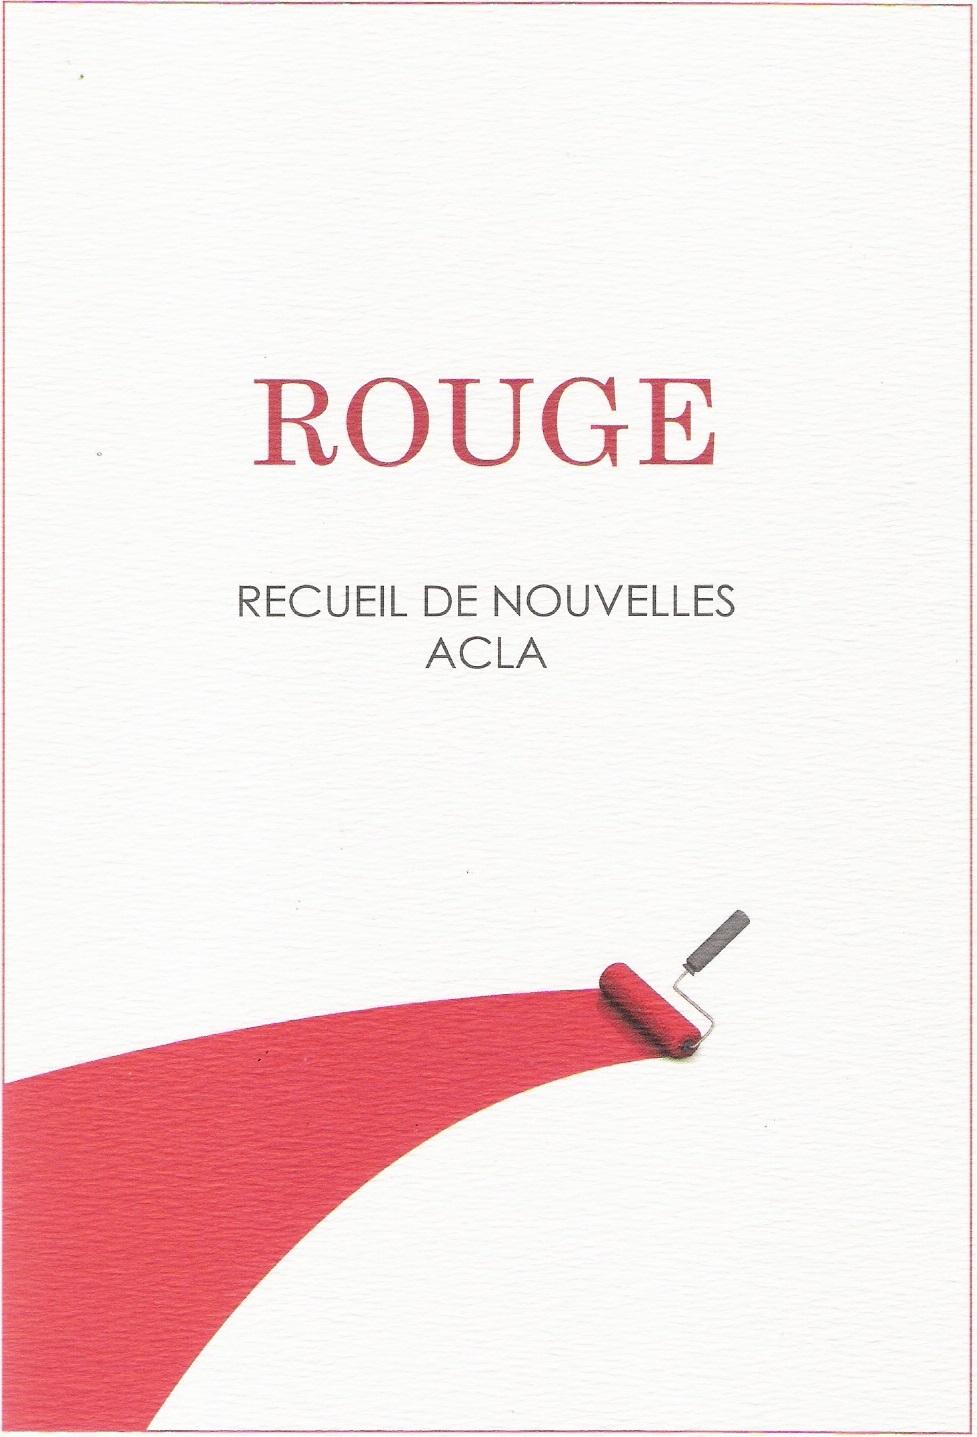 Rouge illustration